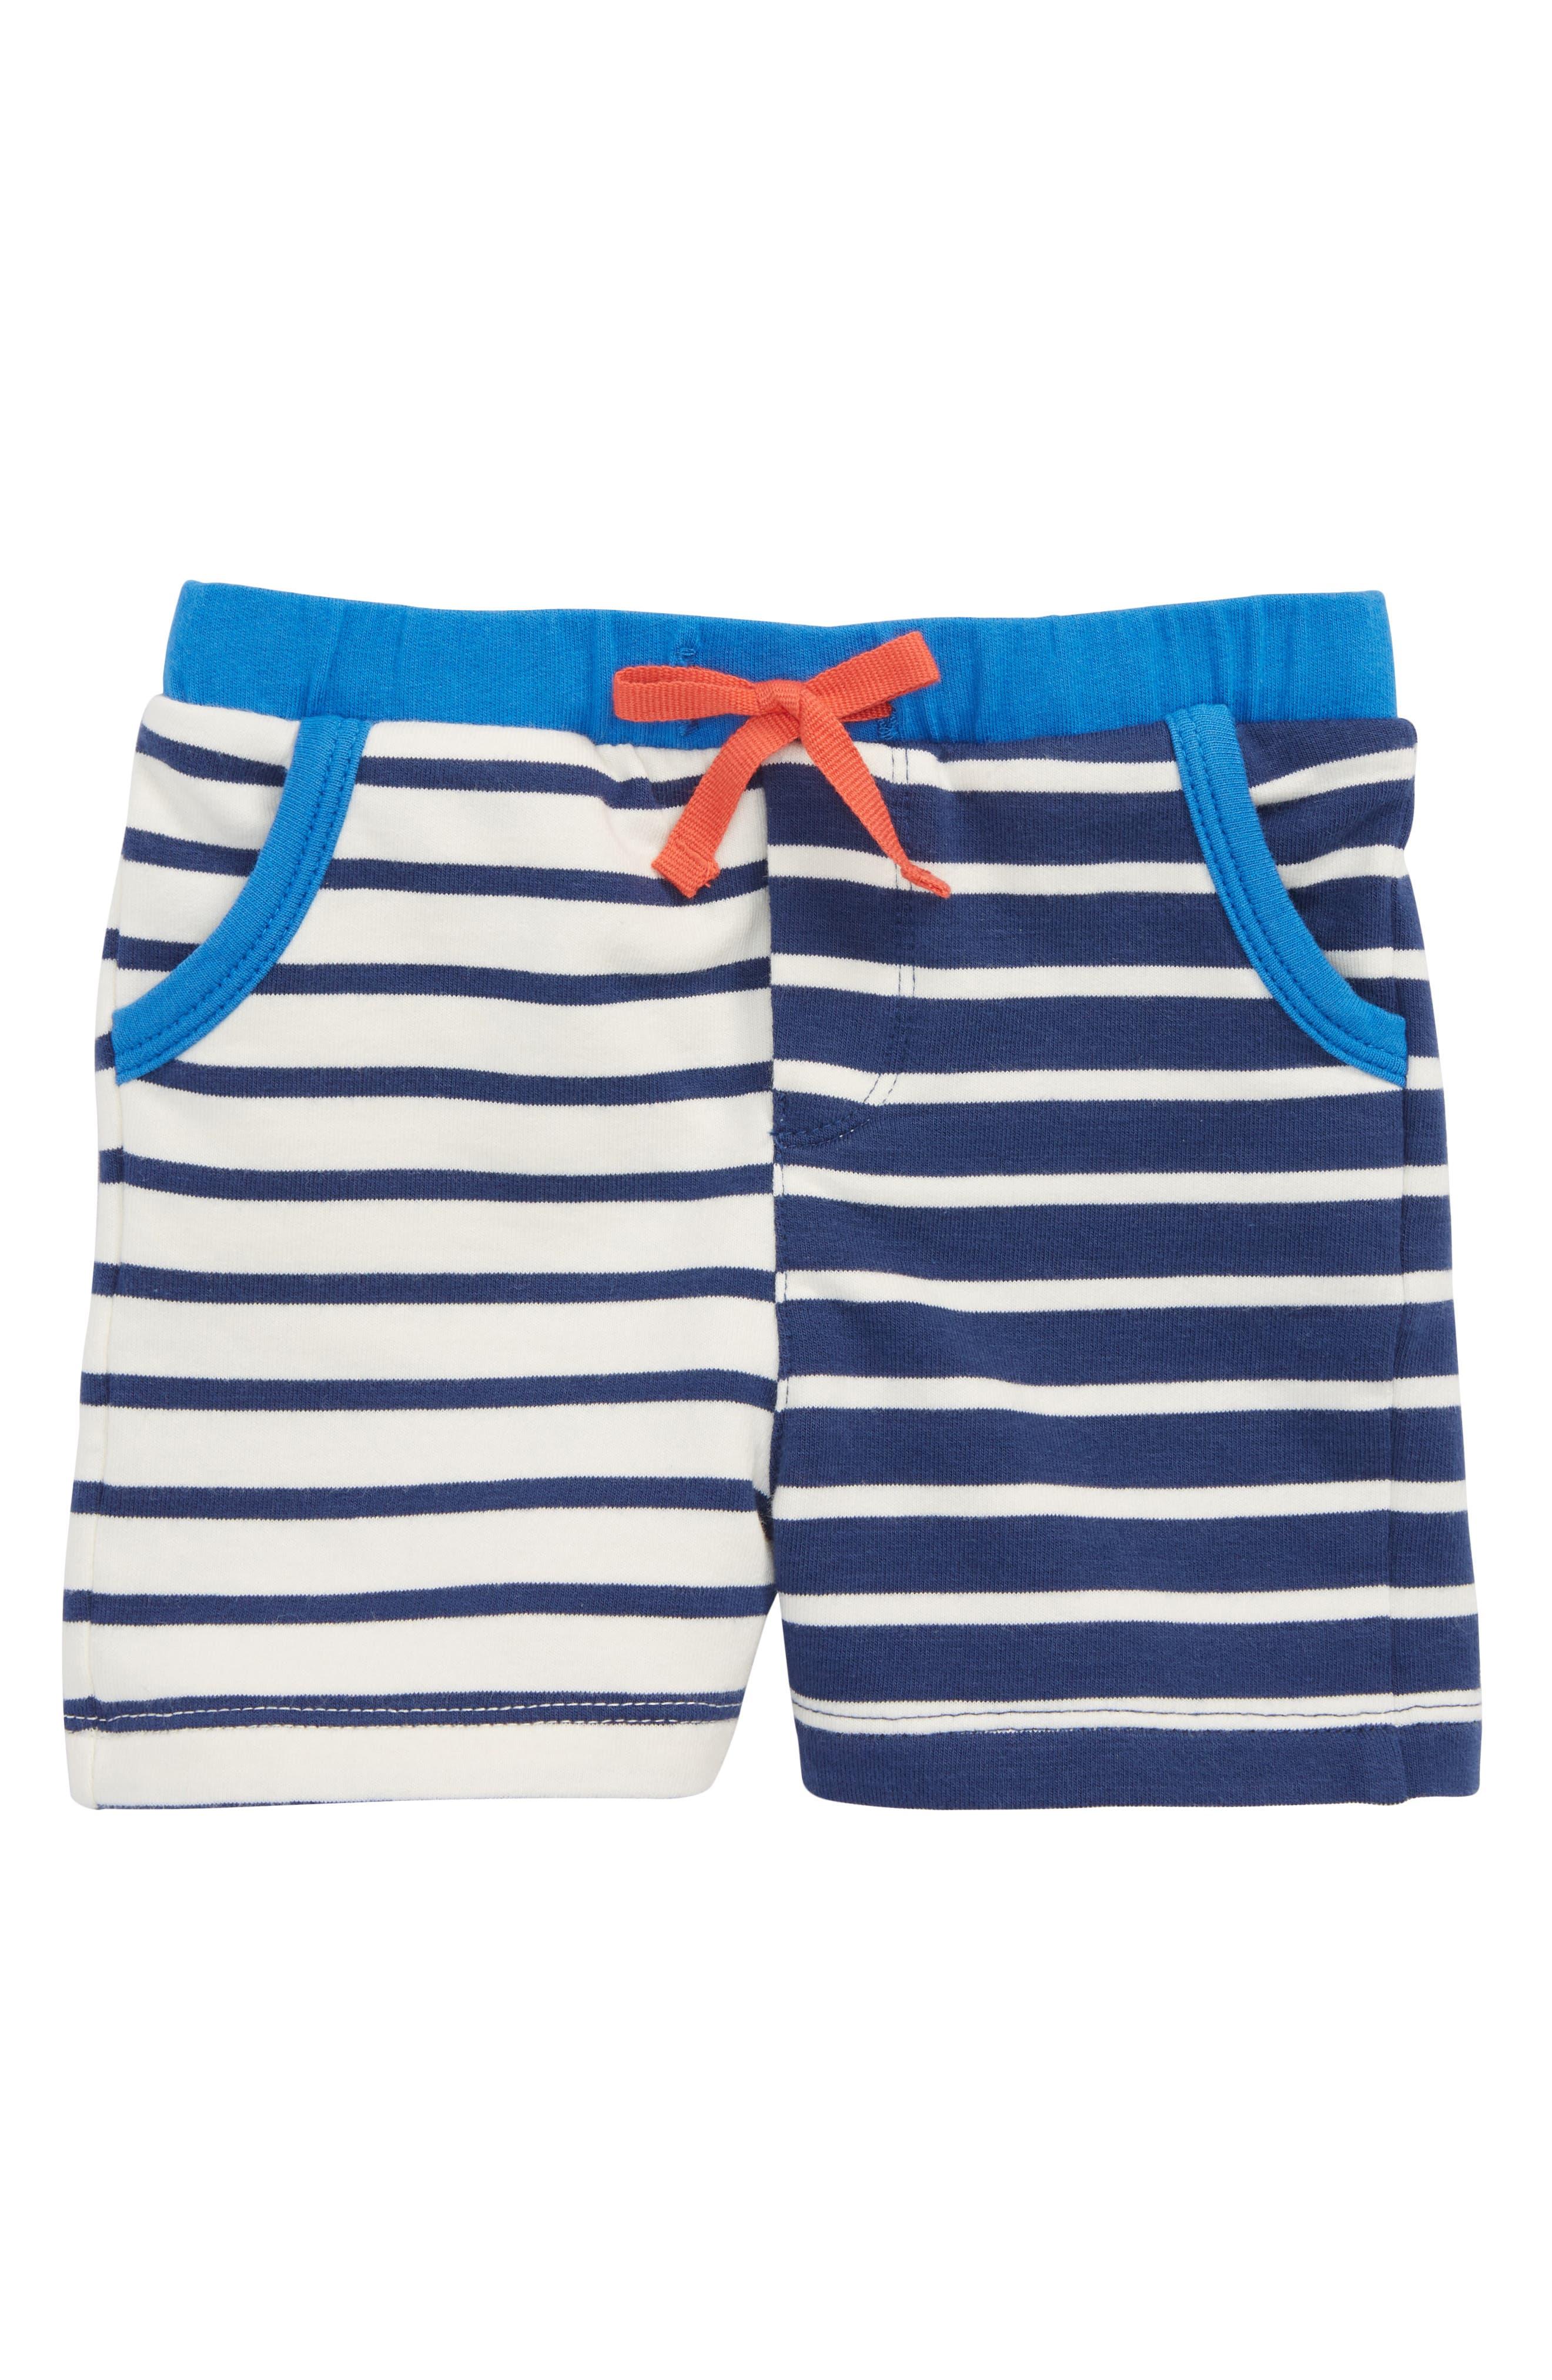 Jersey Shorts,                         Main,                         color, 414